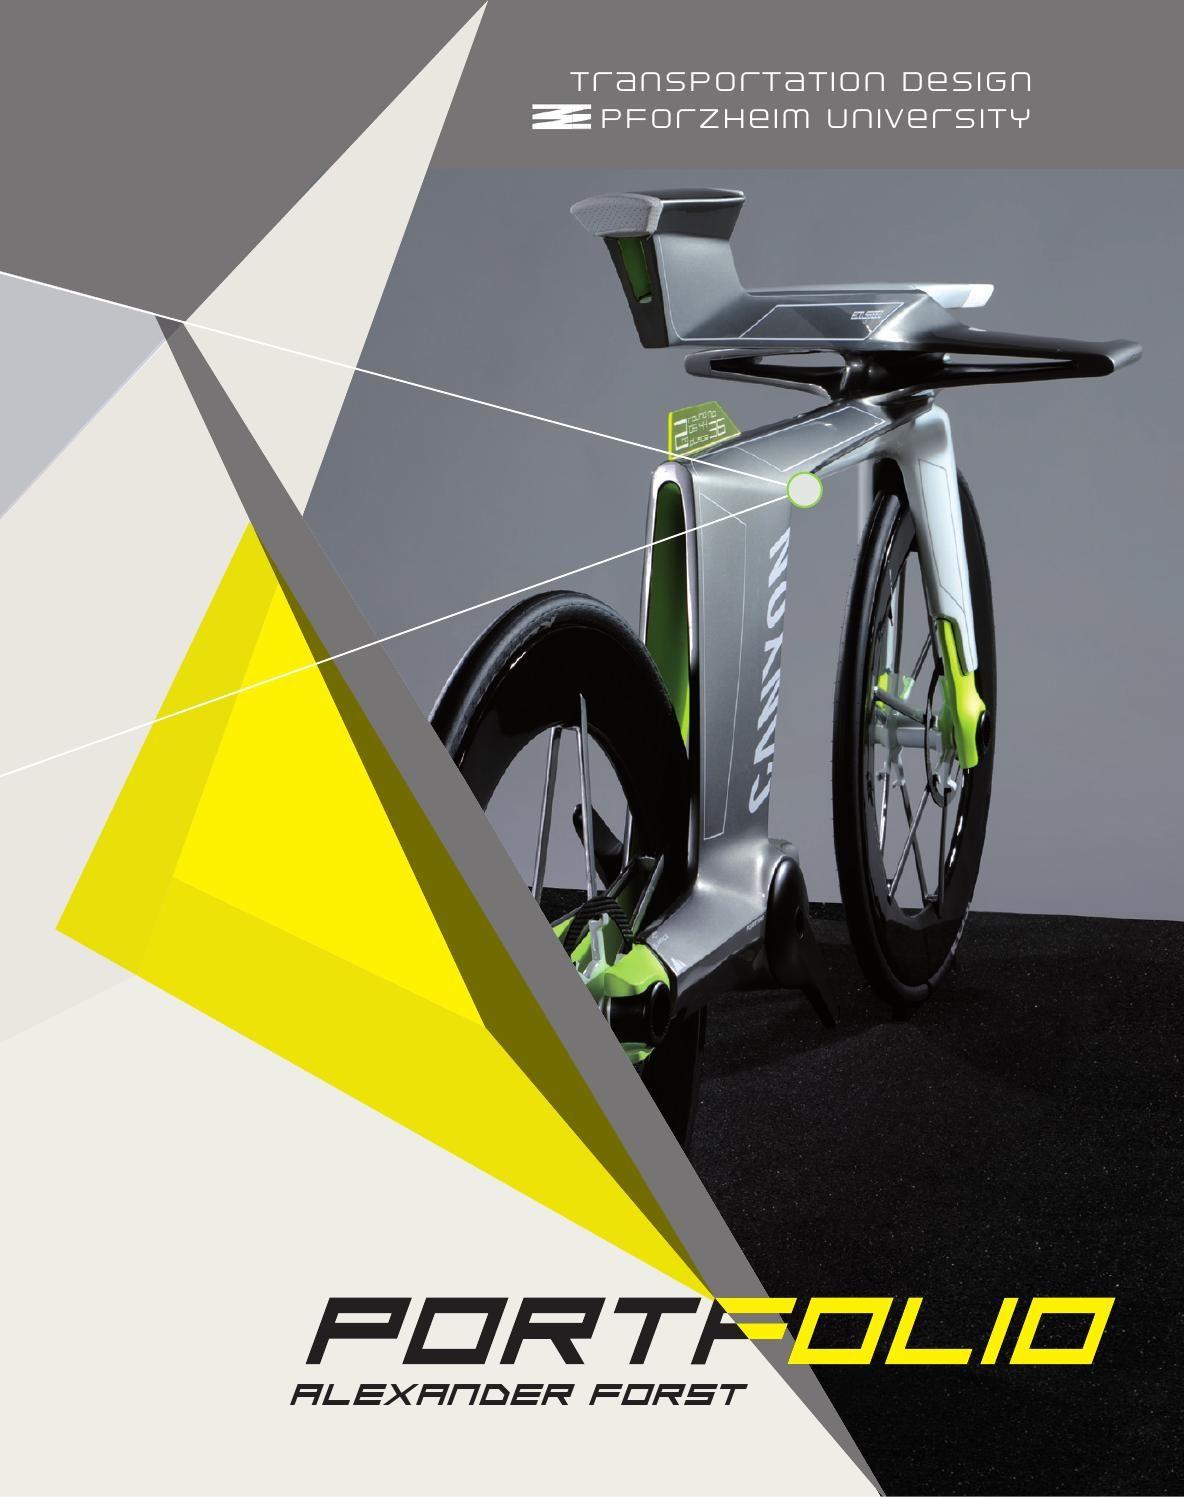 Portfolio Alexander Forst Industrial Design Portfolio Transportation Design Portfolio Design